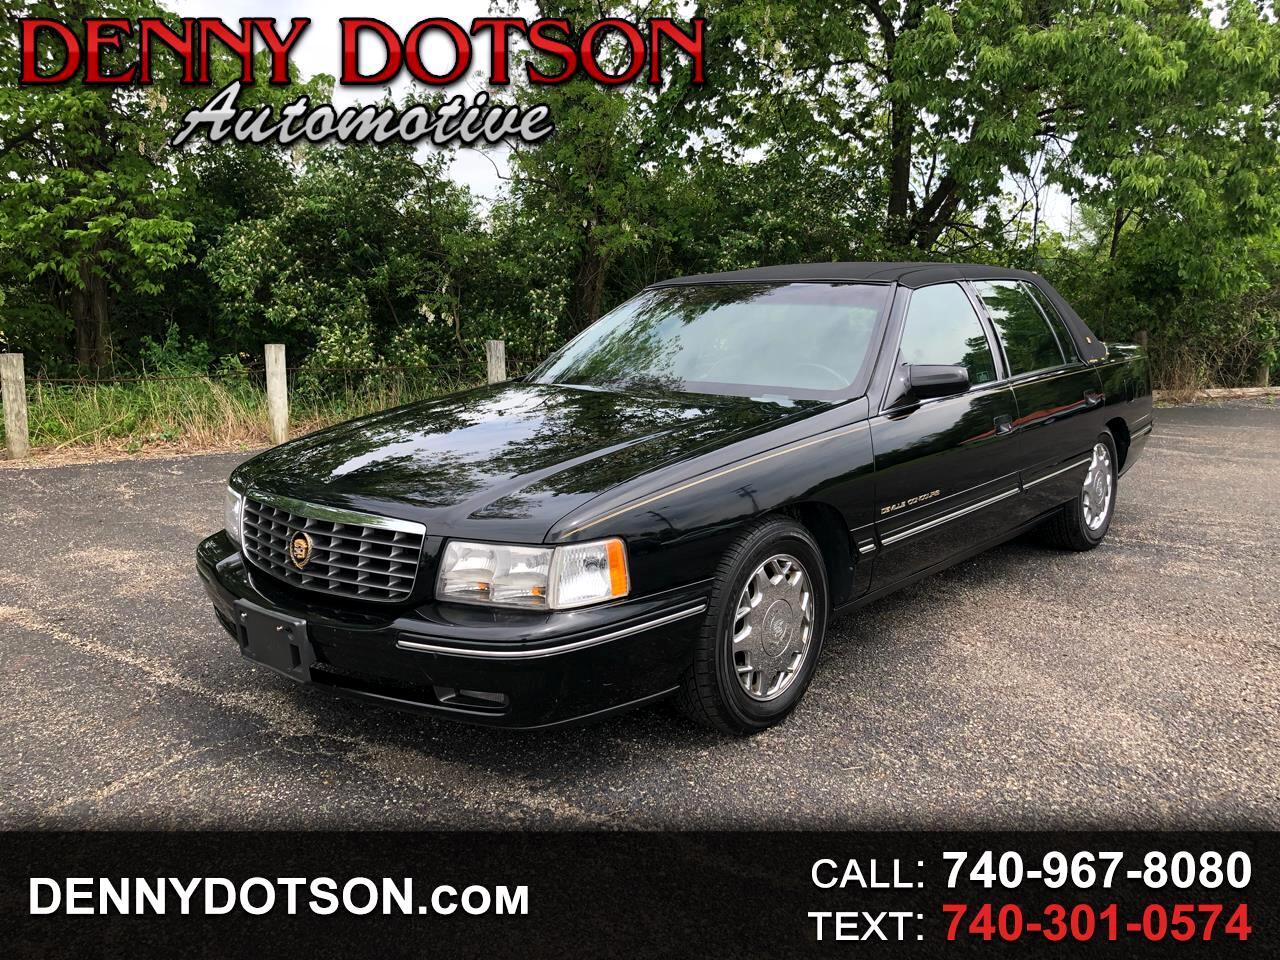 1997 Cadillac Concours 4dr Sedan